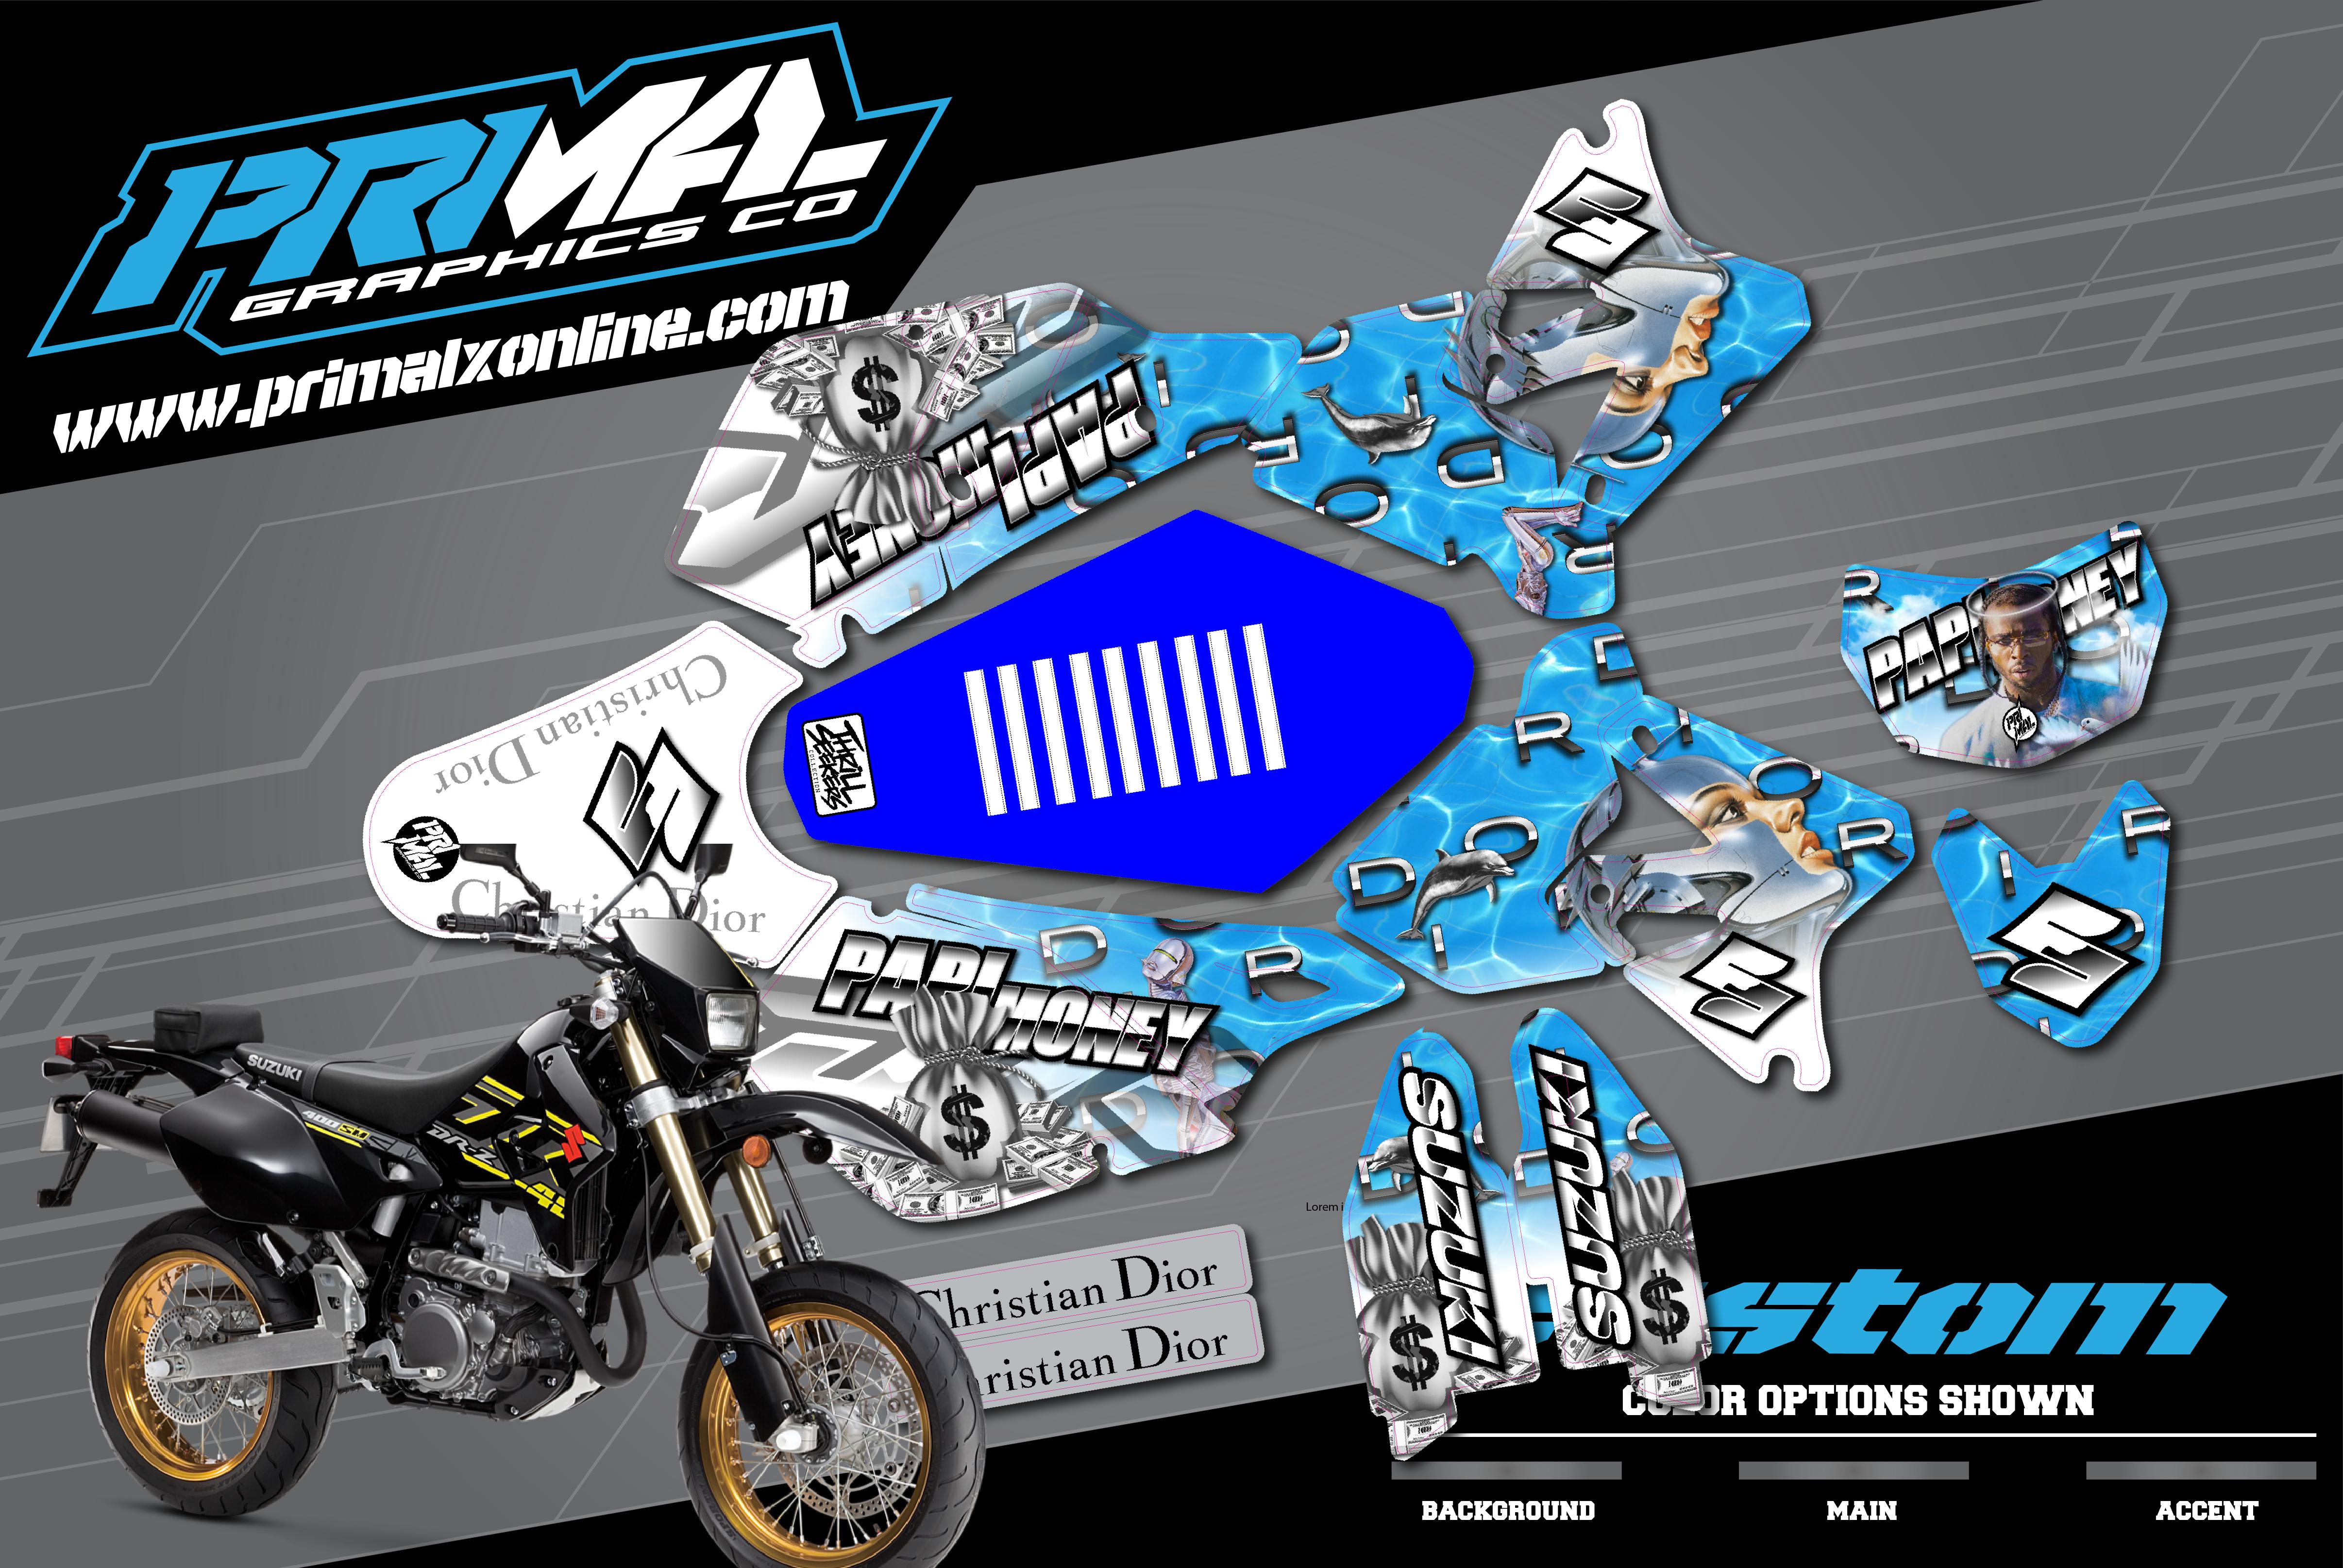 PRIMAL-X-MOTORSPORTS-PRIMAL-GRAPHICS-CO-SUZUKI-DRZ400SM-SUPERMOTO-MOTOCROSS-GRAPHICS-BIKELIFE-DIOR-CHROME-01